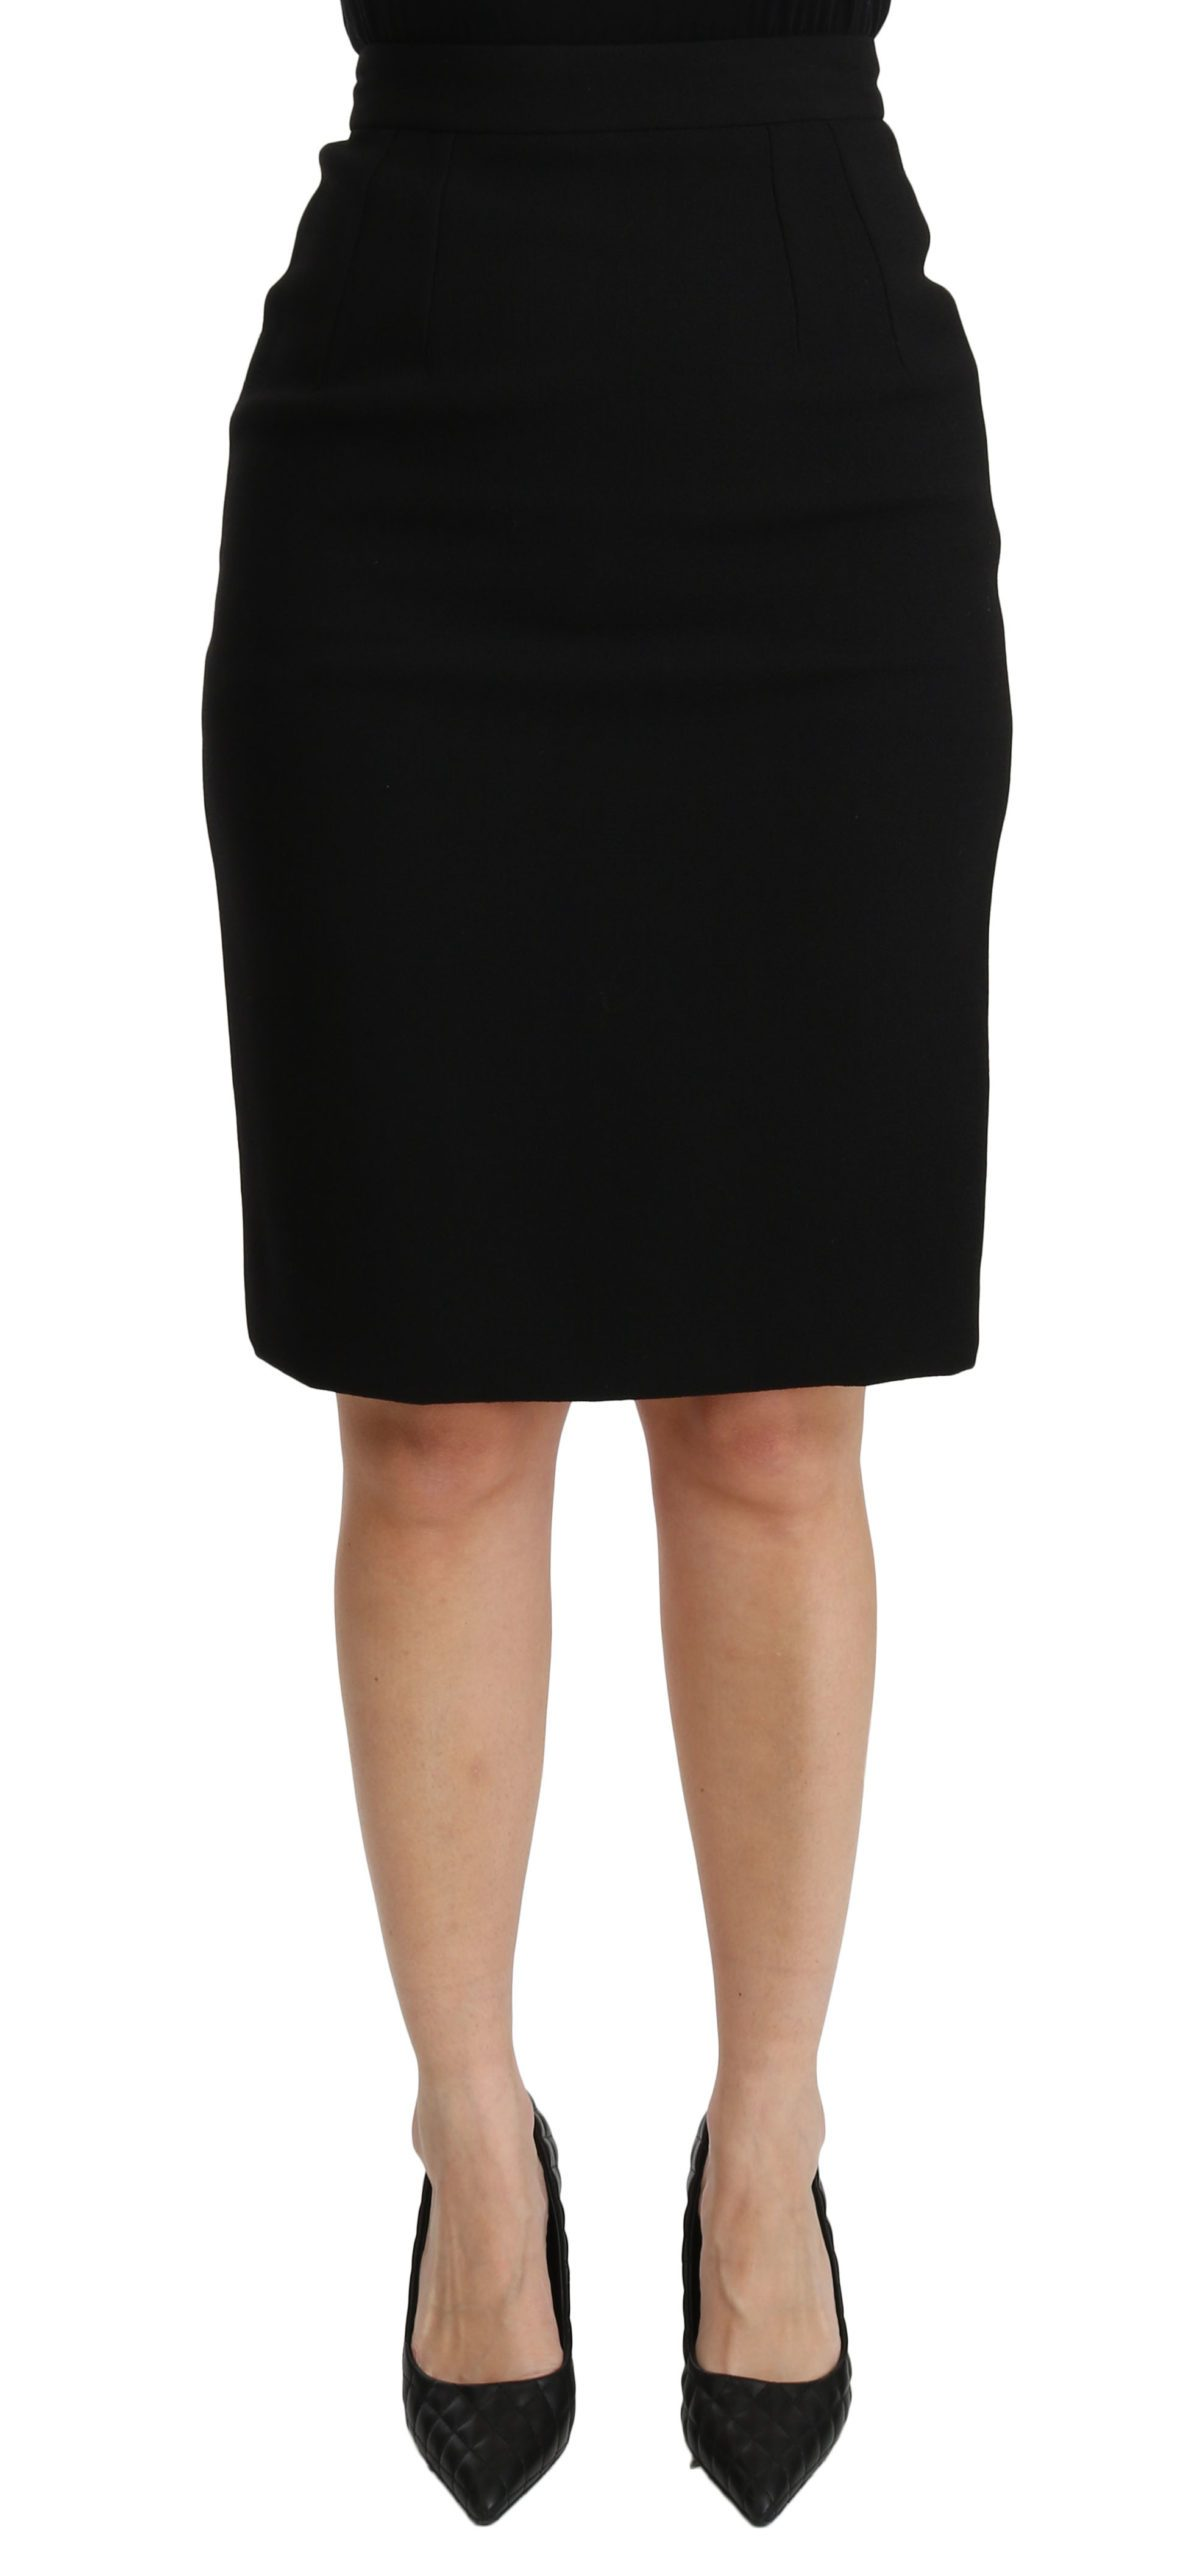 Dolce & Gabbana Women's A-line High Waist Mini Skirt Black SKI1382 - IT40|S